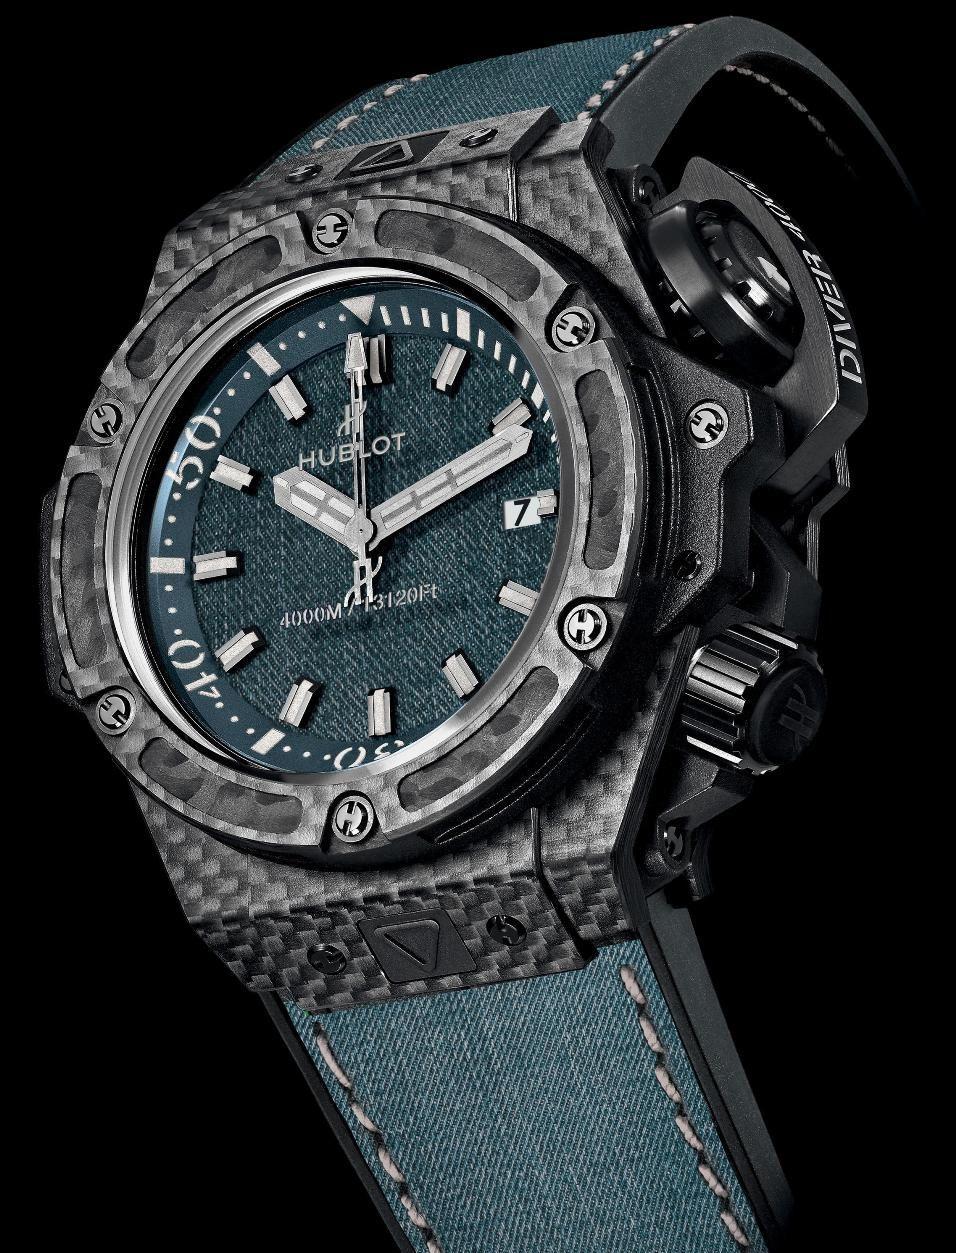 89433dbbcb2 ♂ Watch Hublot Oceanographic 4000 Jeans.